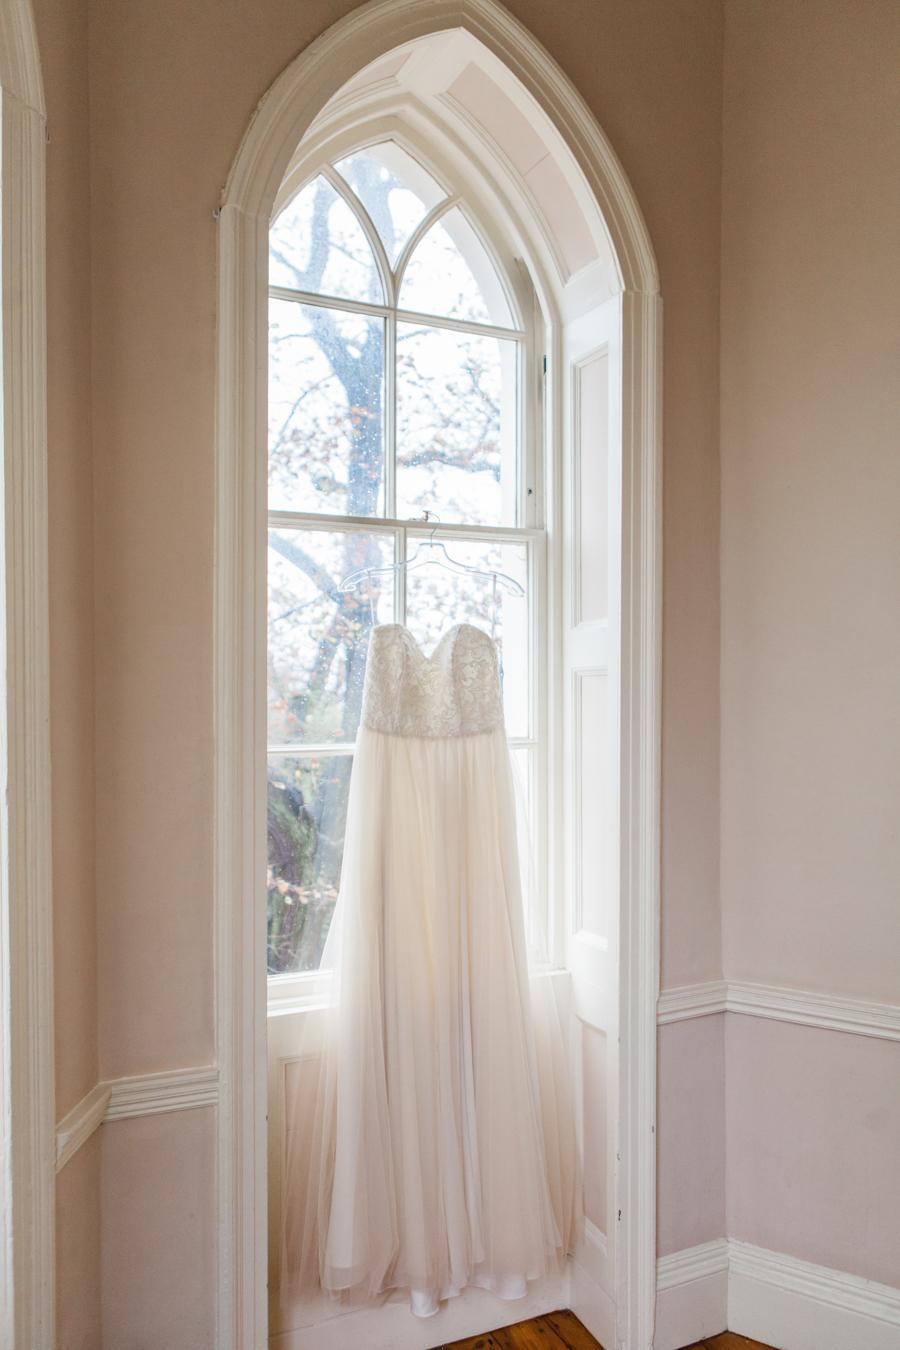 Starry celestial wedding inspiration (with a sprinkling of Disney magic) - Amanda Karen Photography (1)